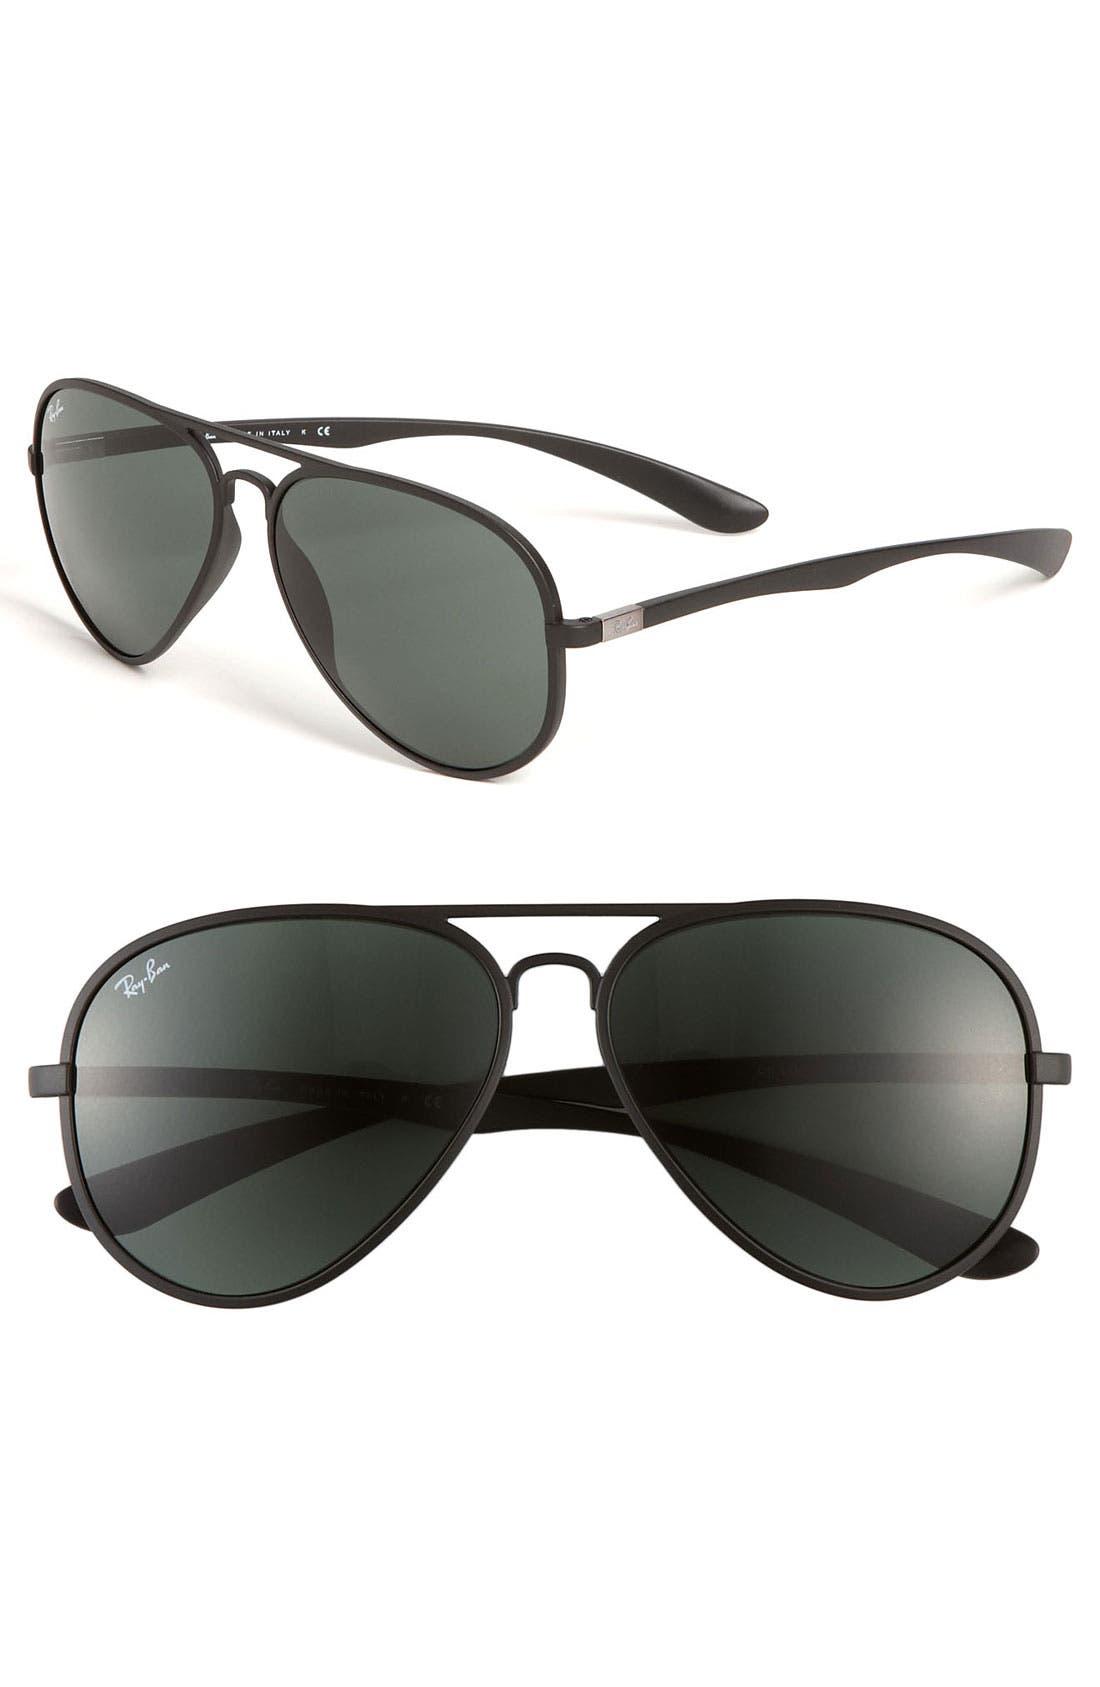 Alternate Image 1 Selected - Ray-Ban 'M Mod Caravan' 58mm Aviator Sunglasses